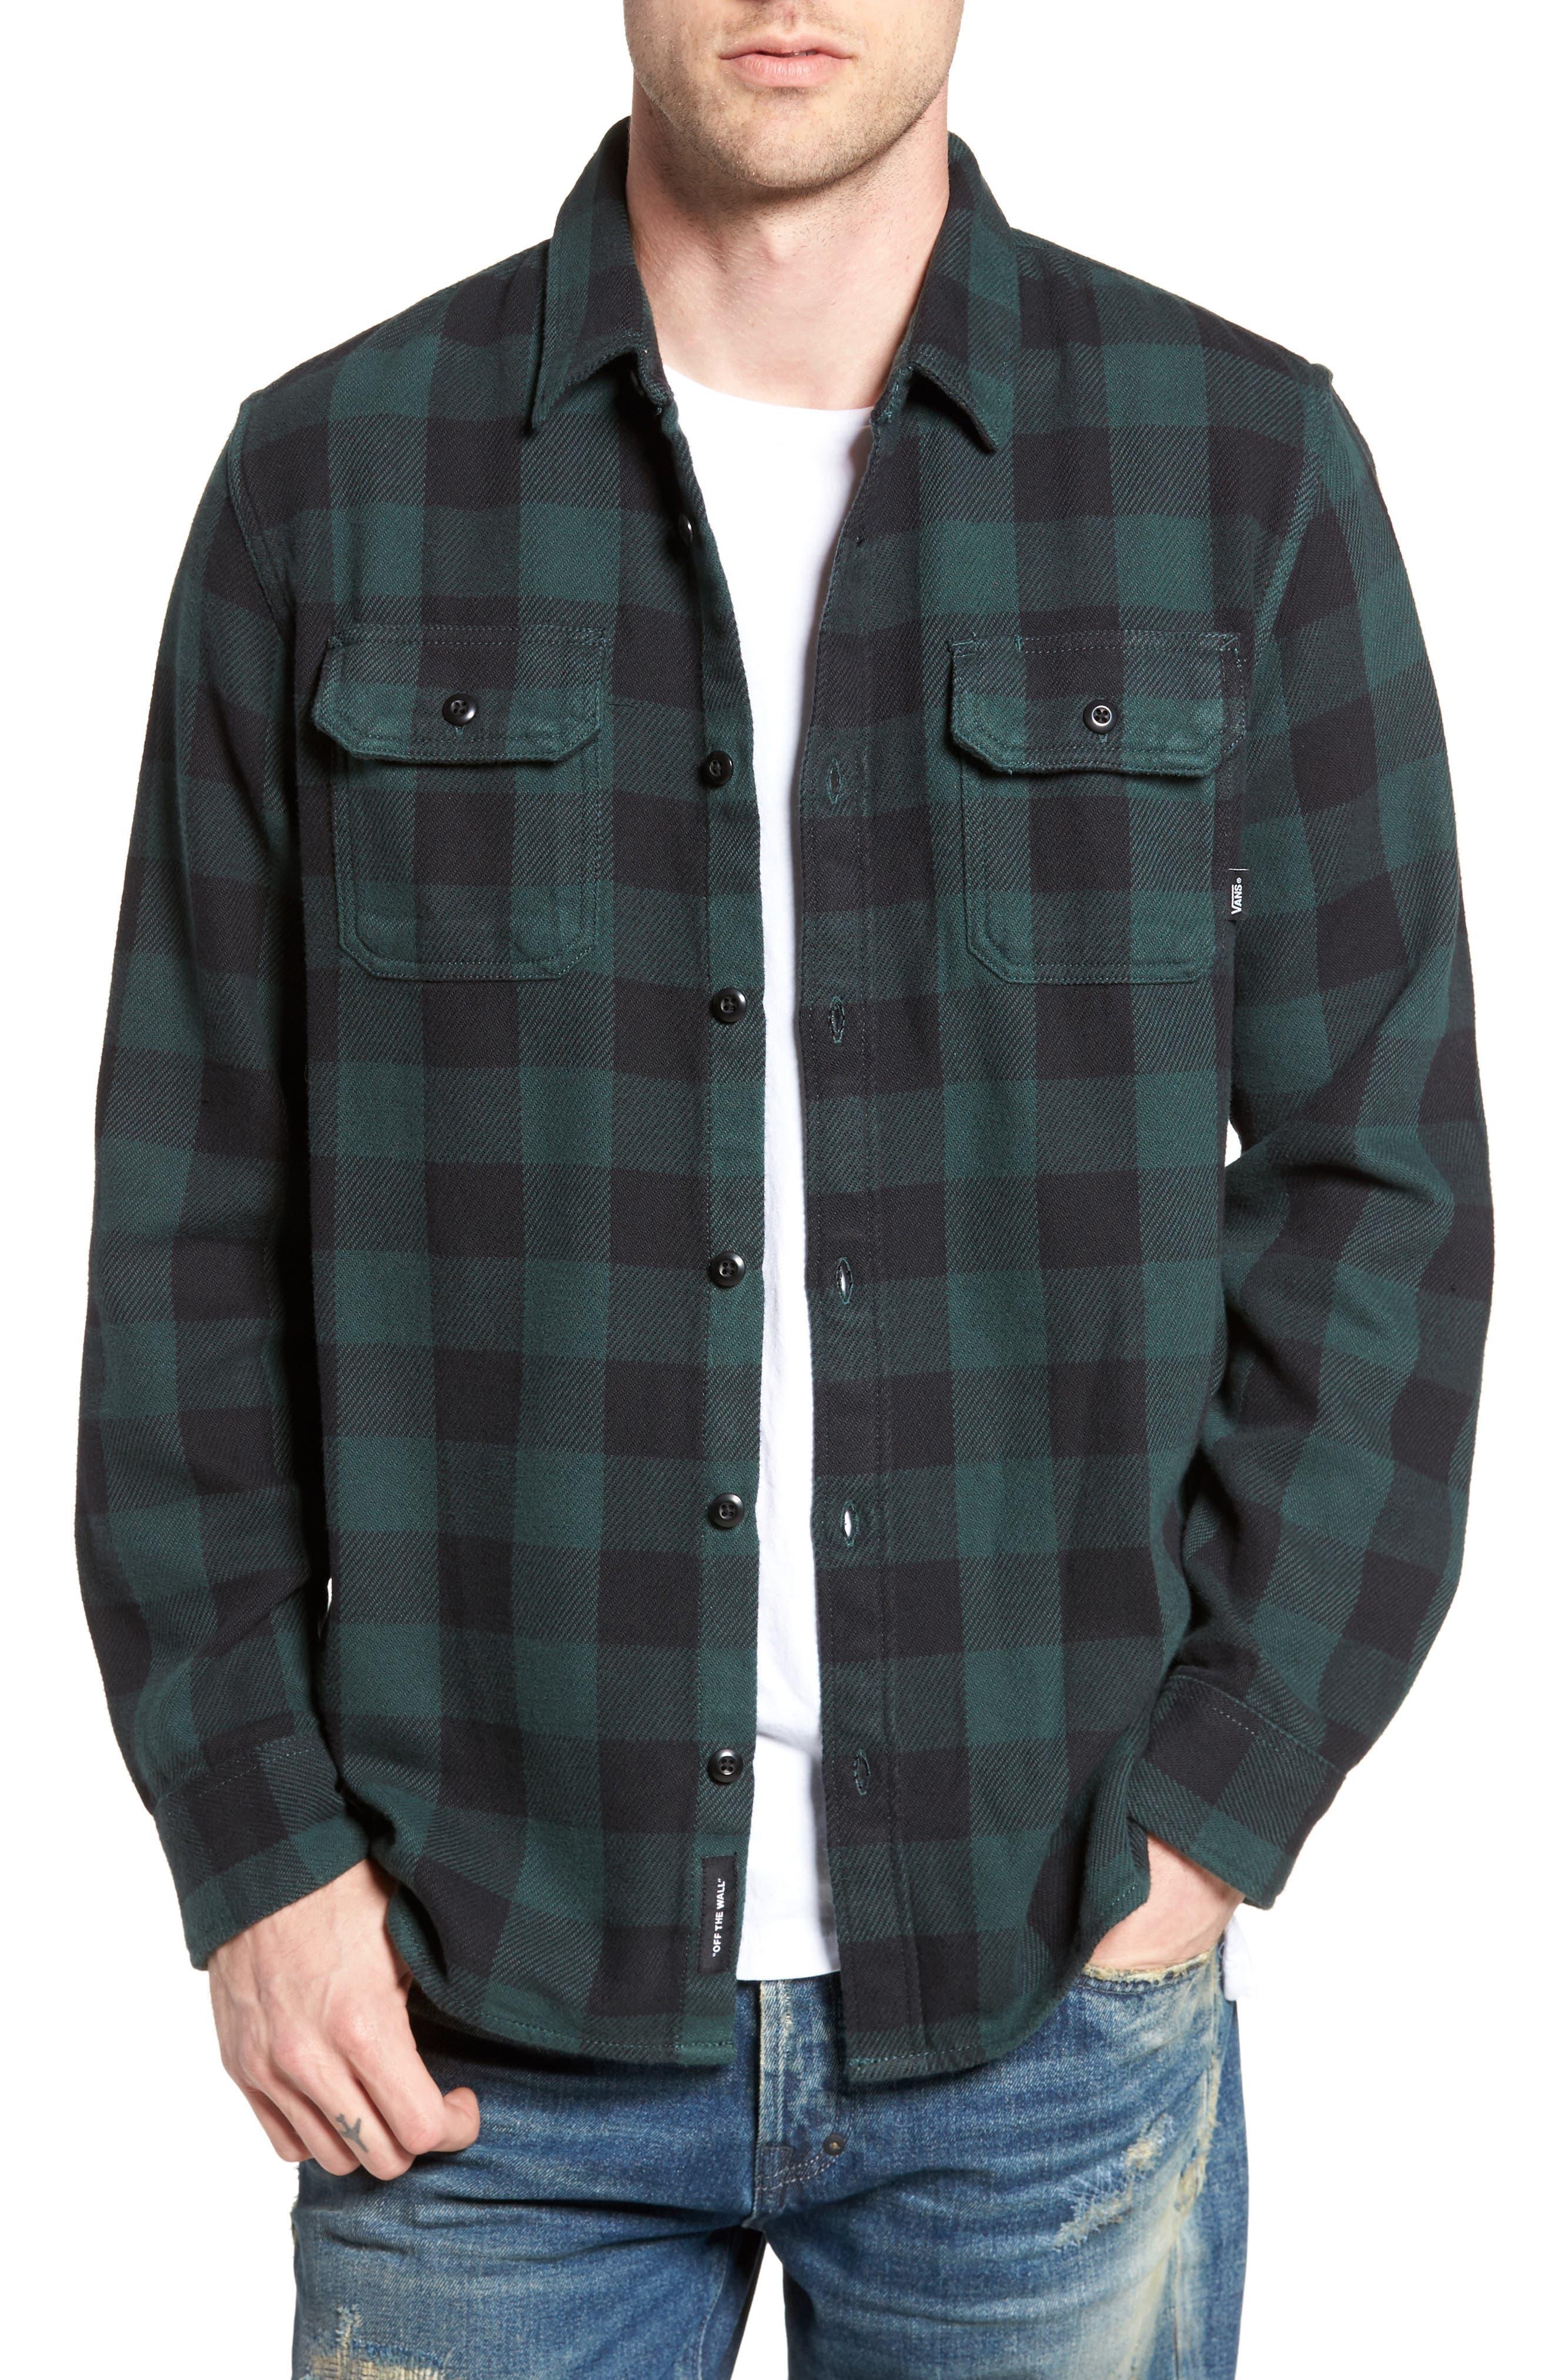 Main Image - Vans Wisner Plaid Shirt